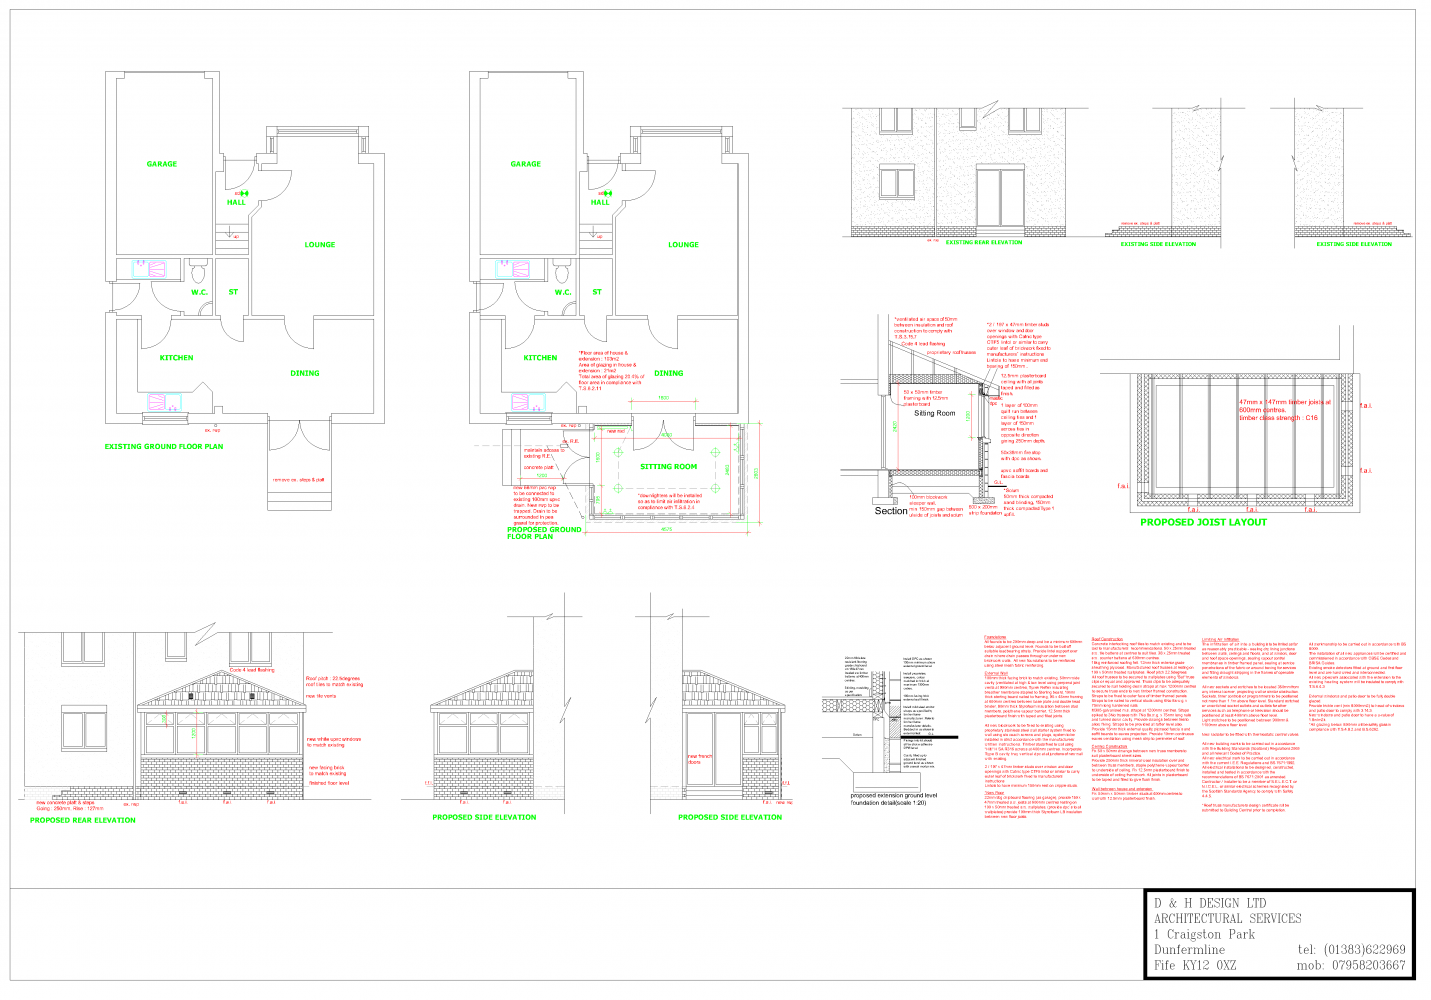 single storey extension plans, Dunfermline, dinburgh, Livingston ... - ^